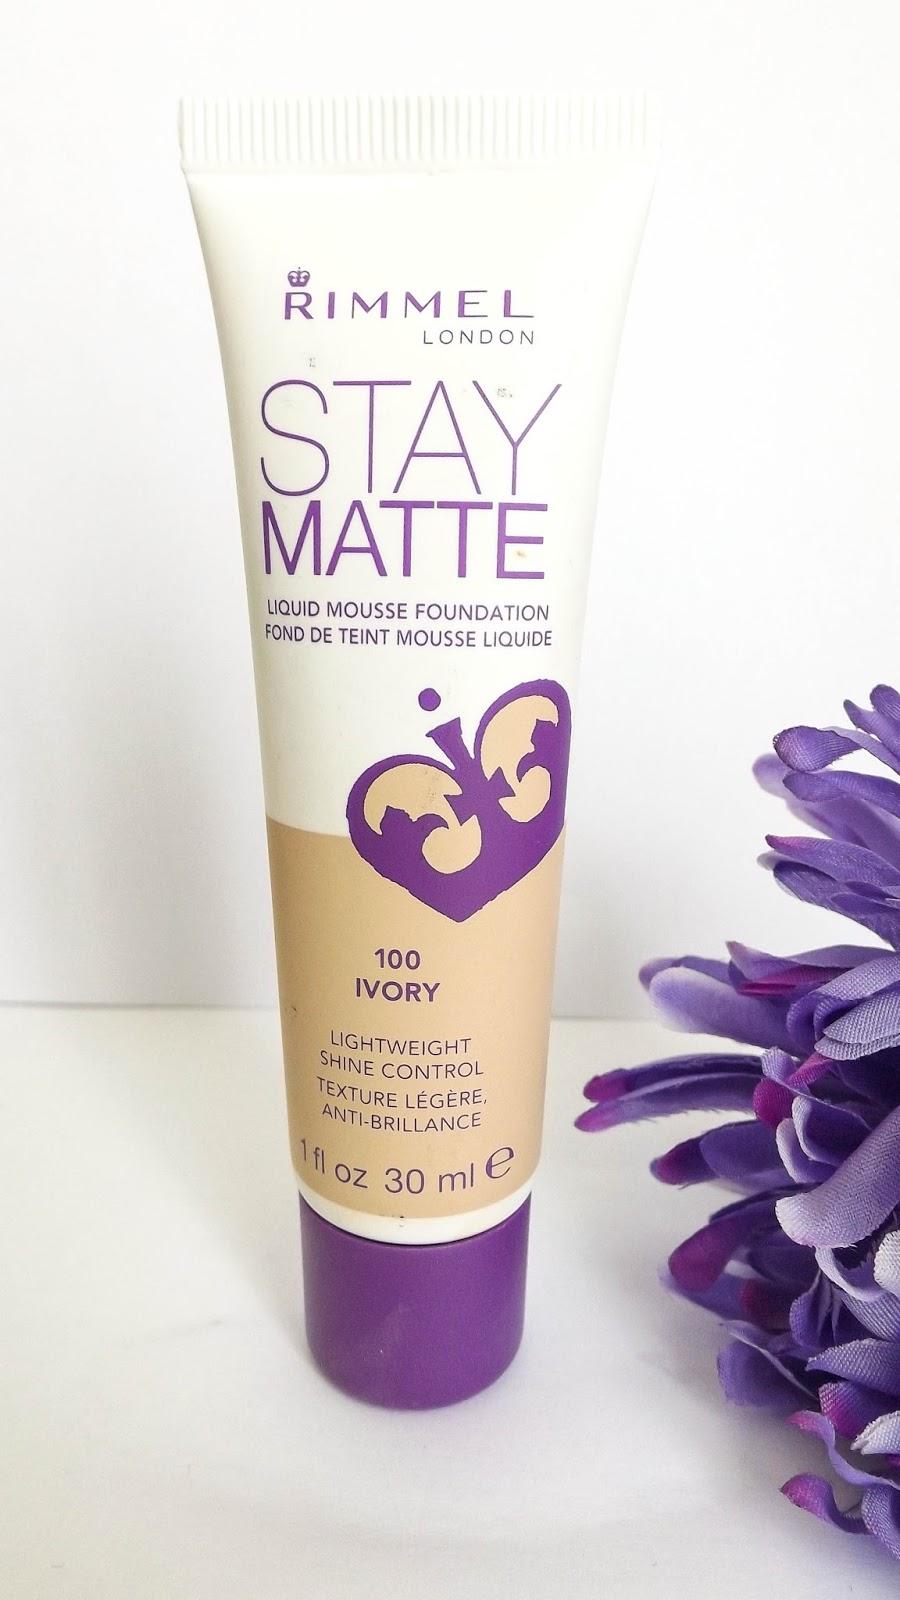 Rimmel Stay Matte Liquid Mousse Foundation Review Iris Shades